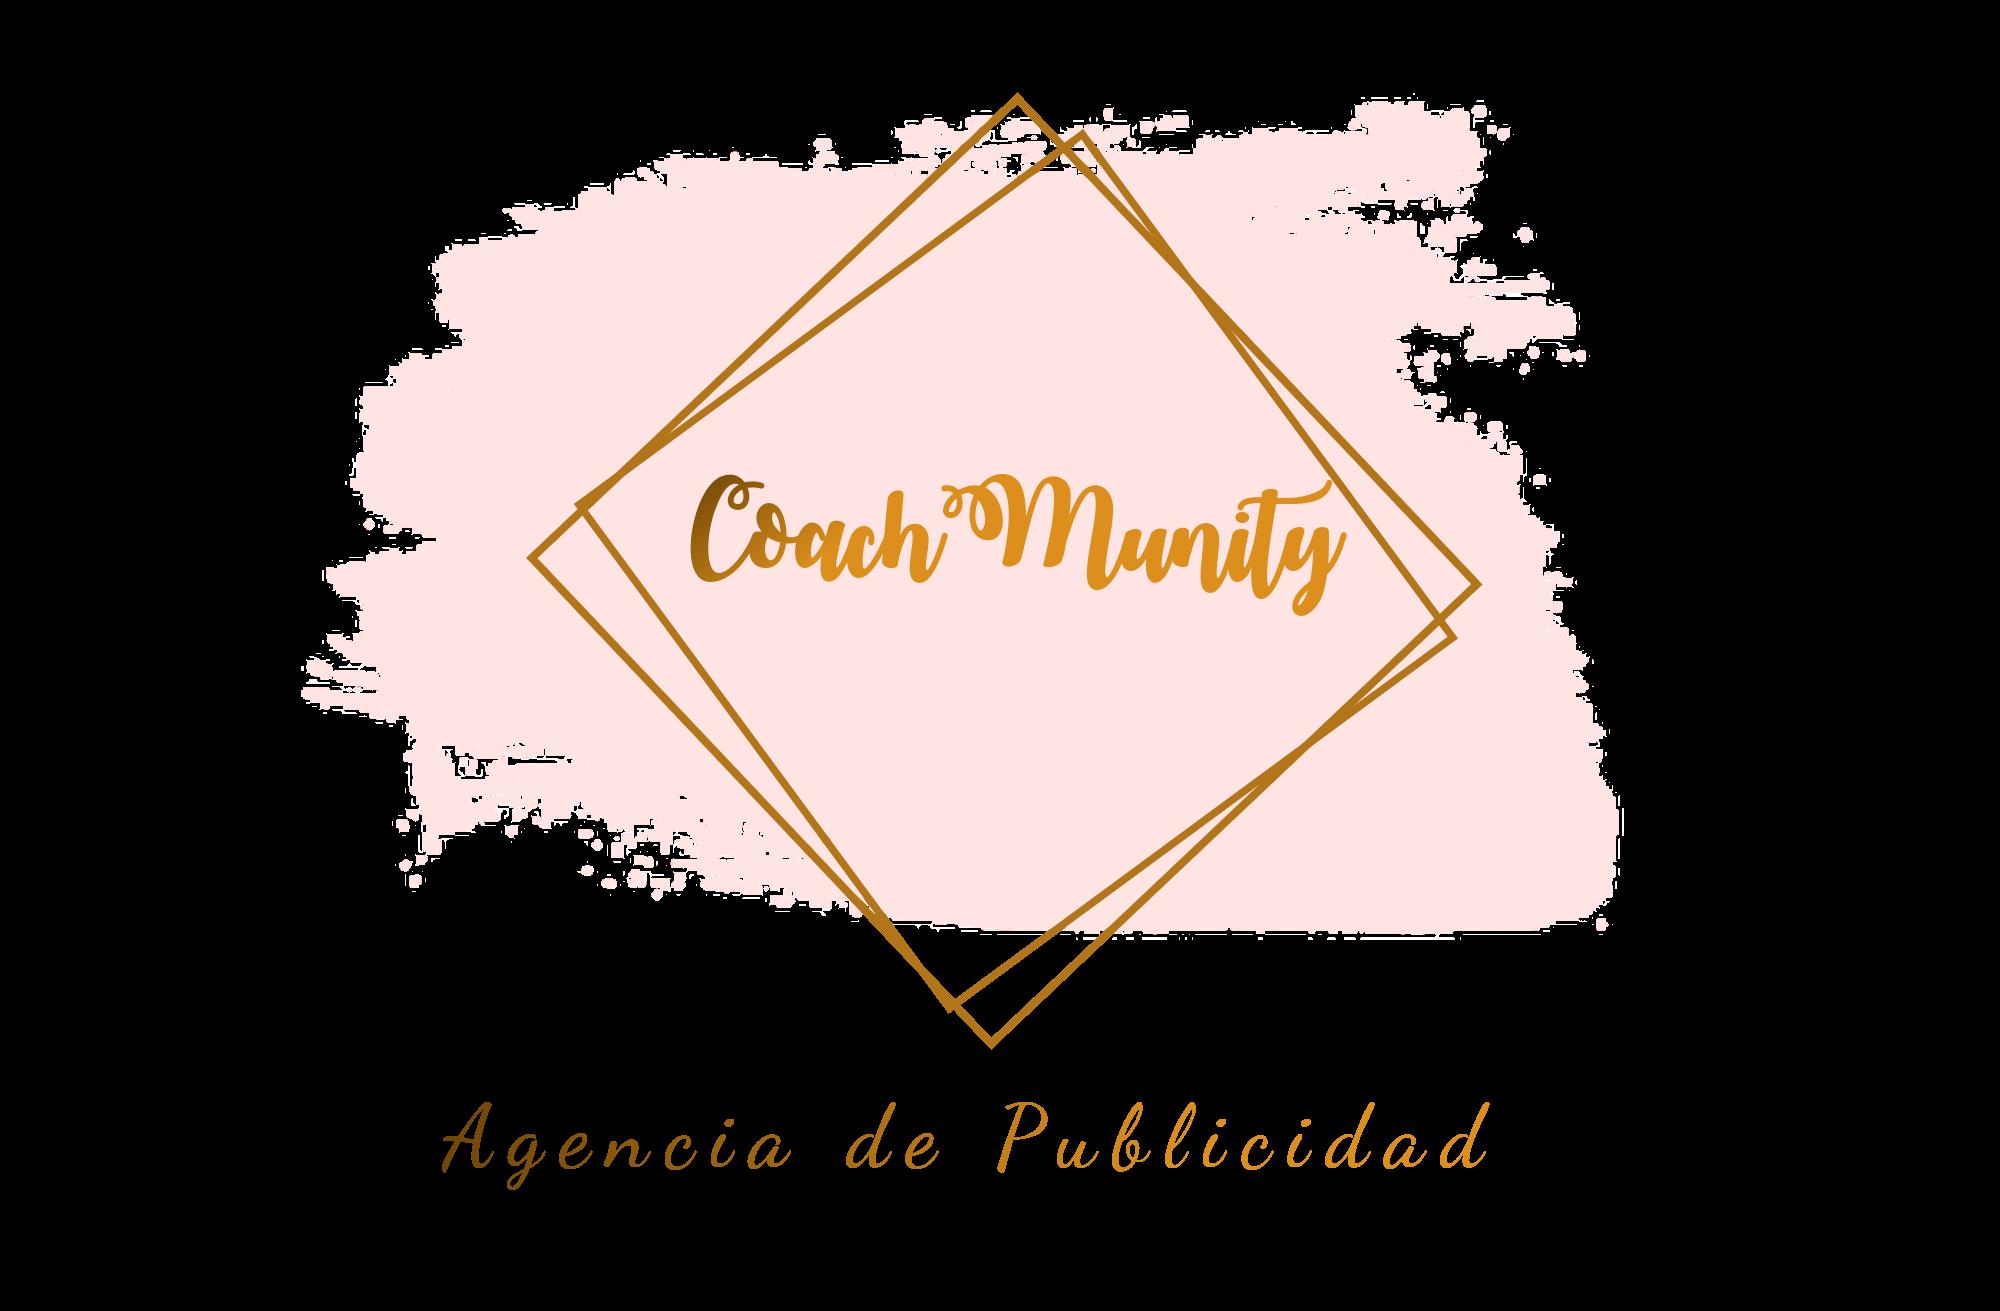 Coachmunity